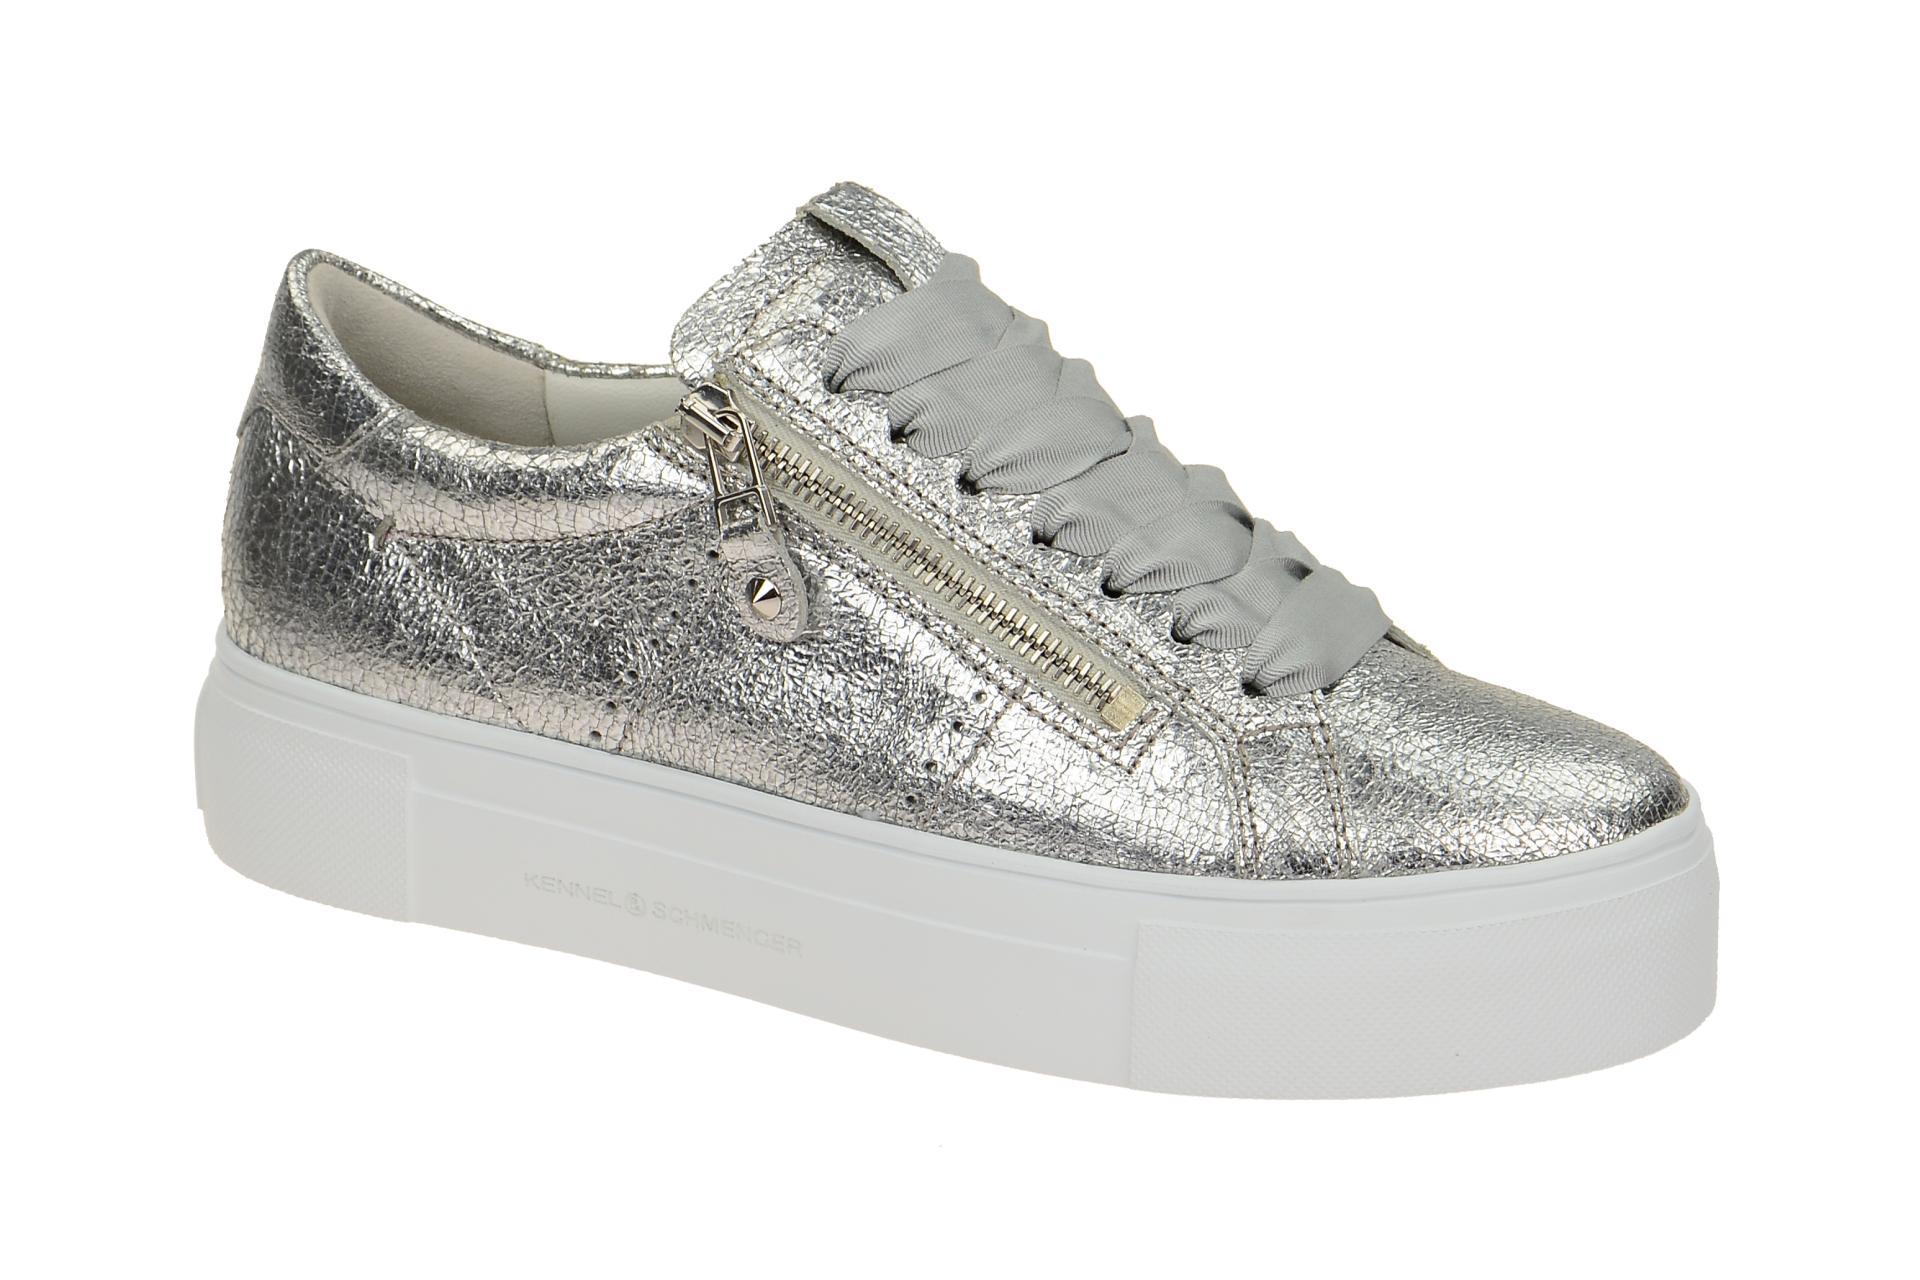 premium selection fdb69 477b0 K+S Big Plateau Sneaker silber metallic